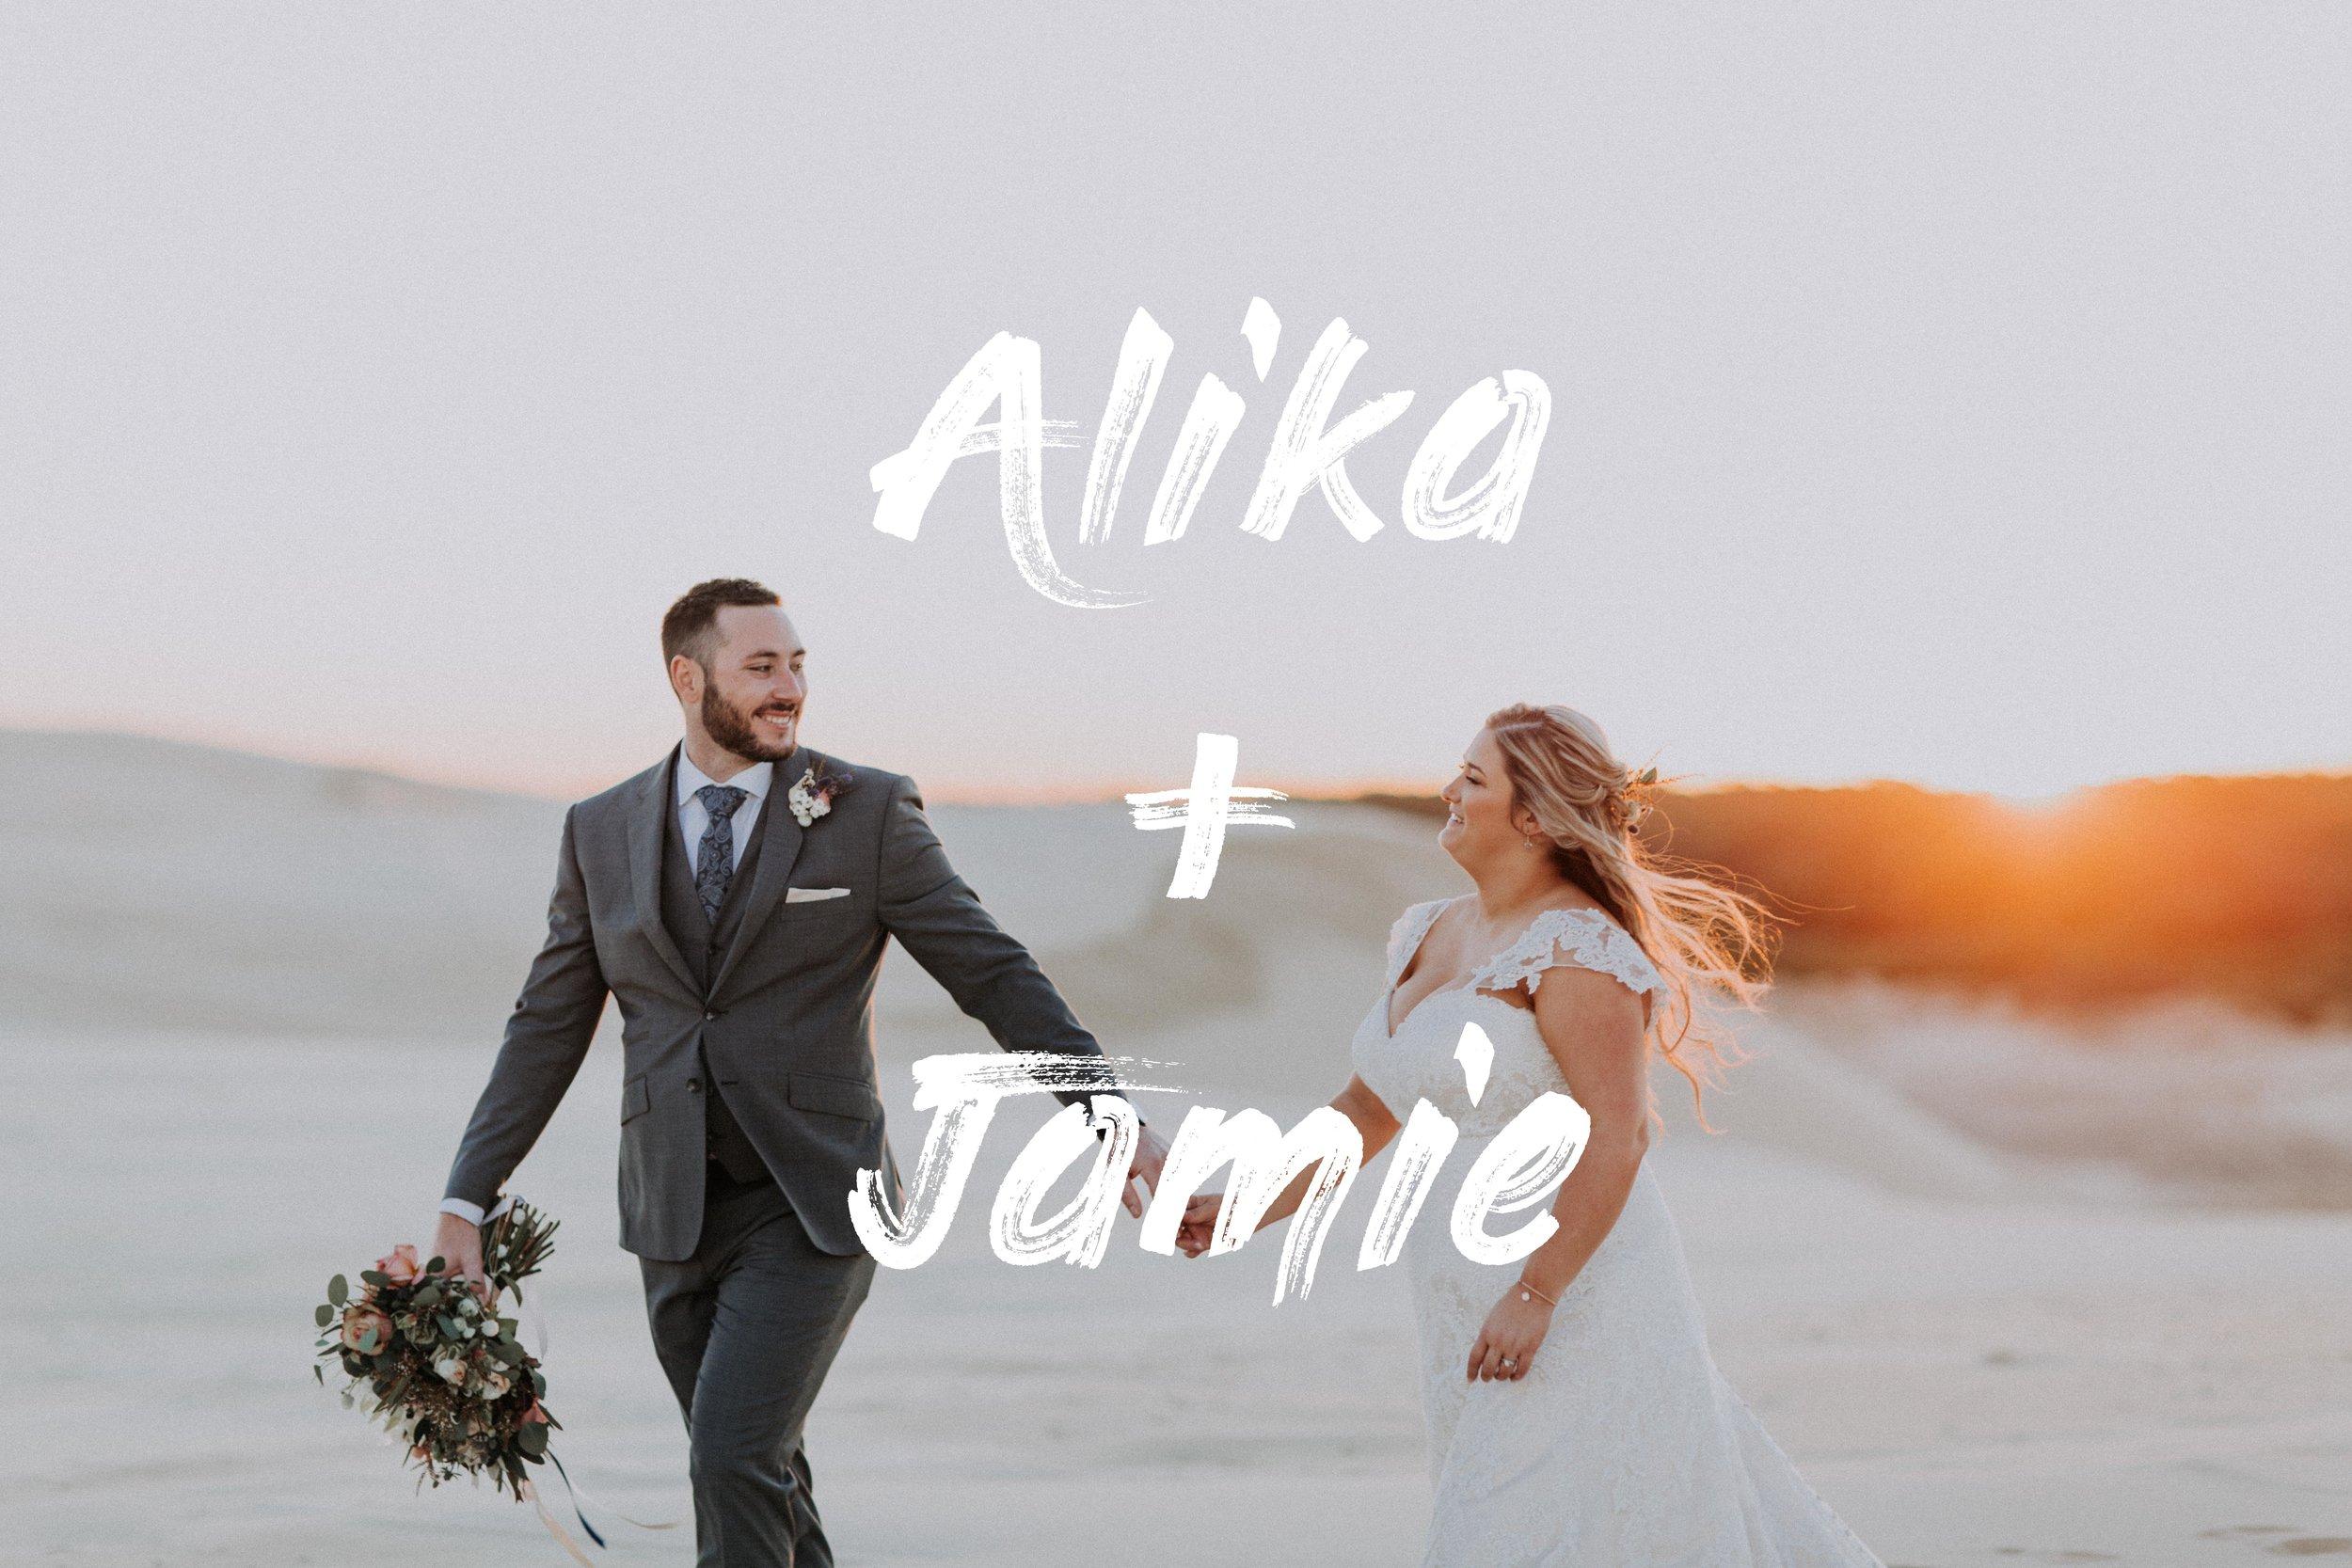 Alika + Jamie - Finals-344.jpg